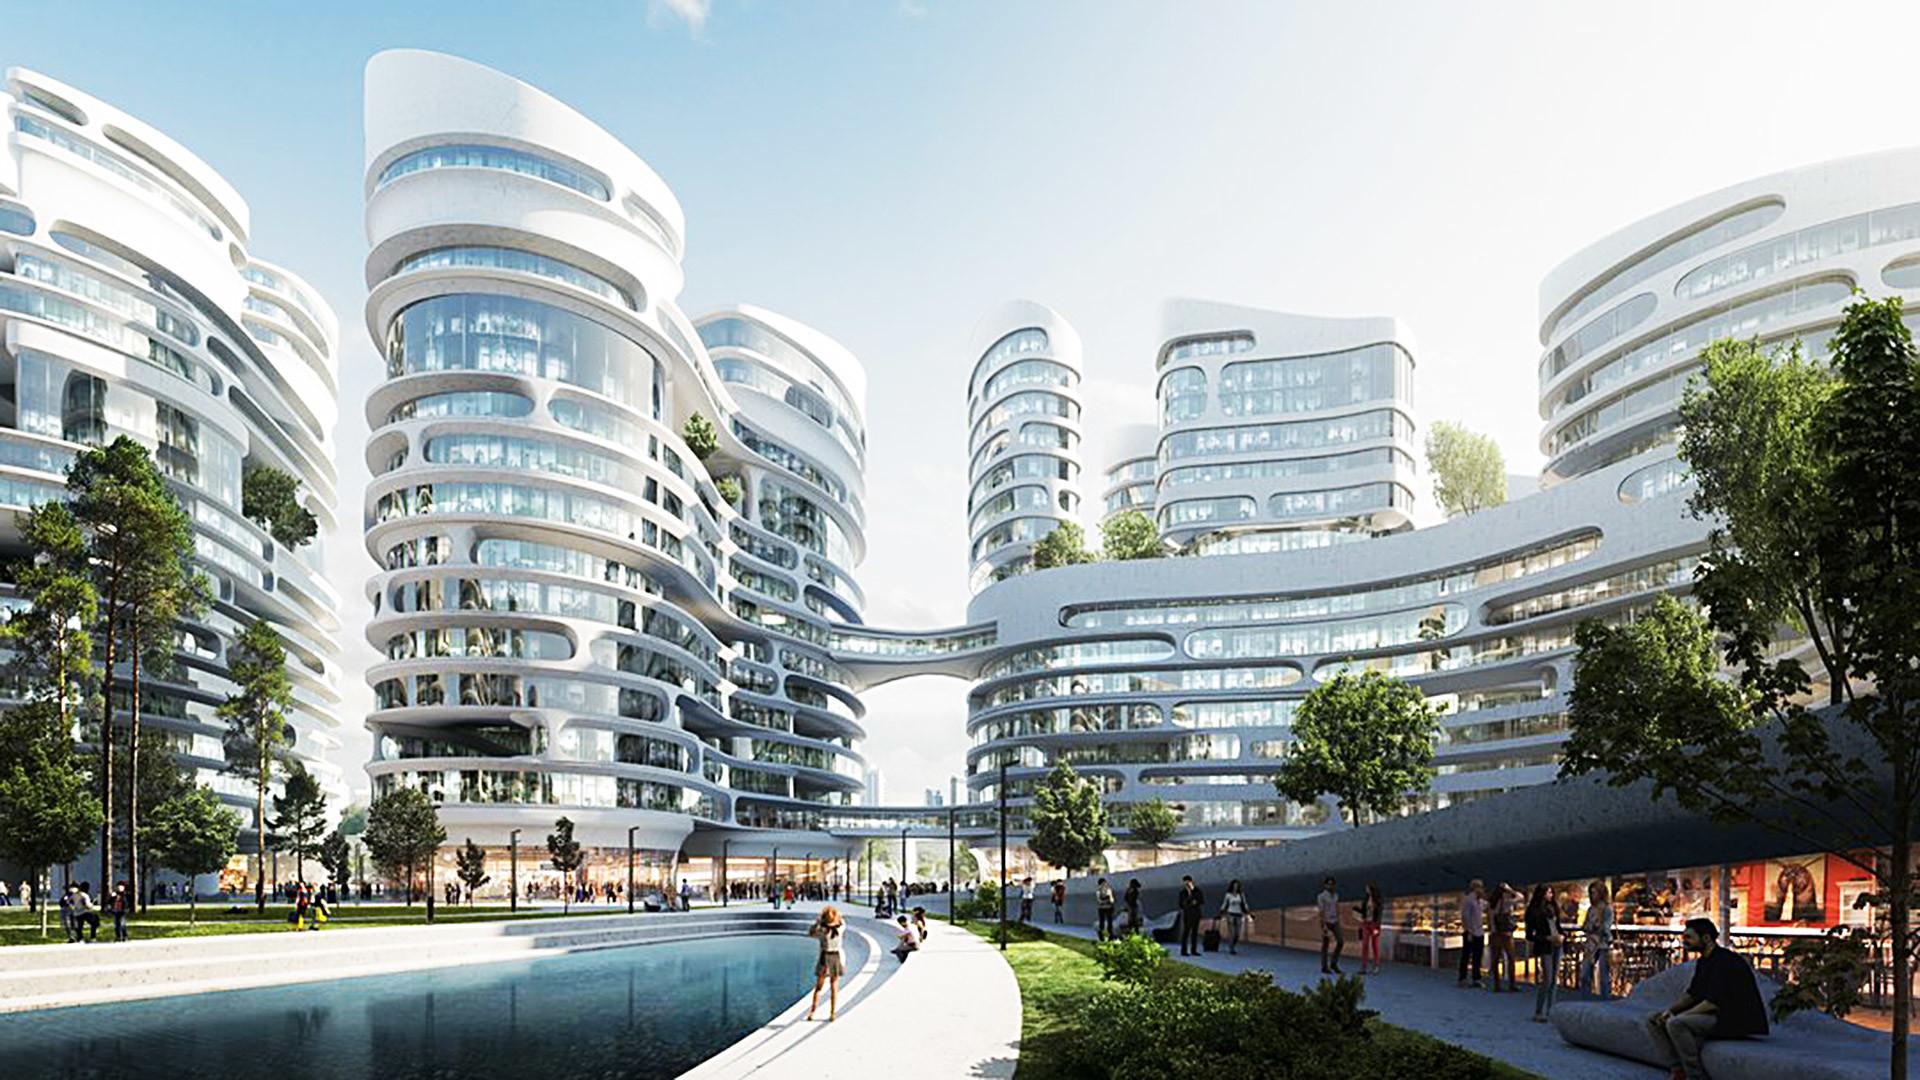 Zaha Hadid Architects To Build A Smart City In Moscow Region